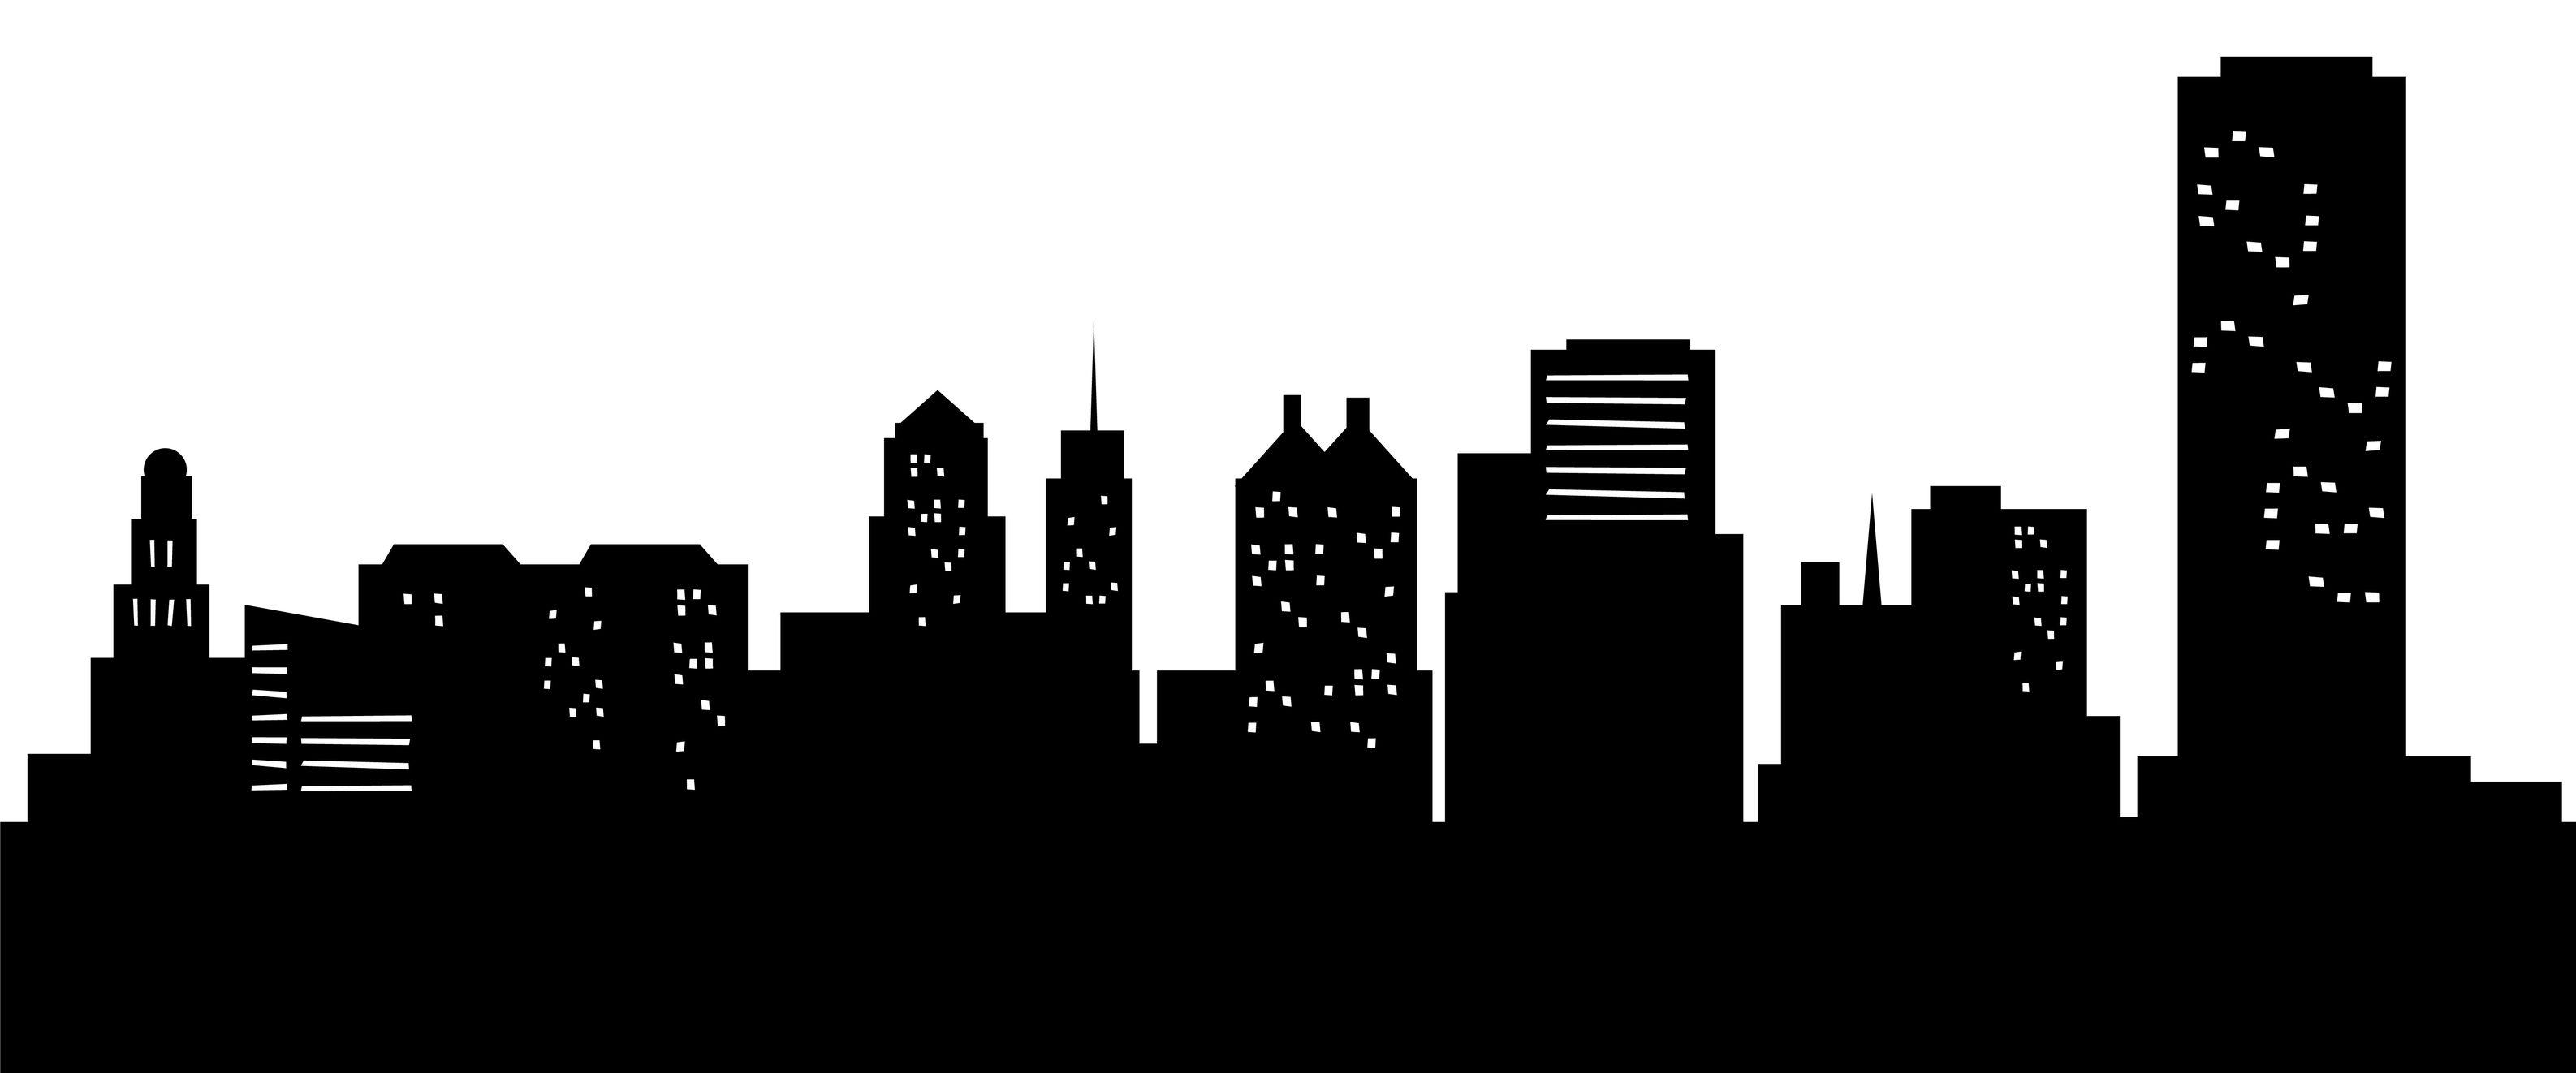 Free City Skyline Silhouette, Download Free Clip Art, Free Clip Art.